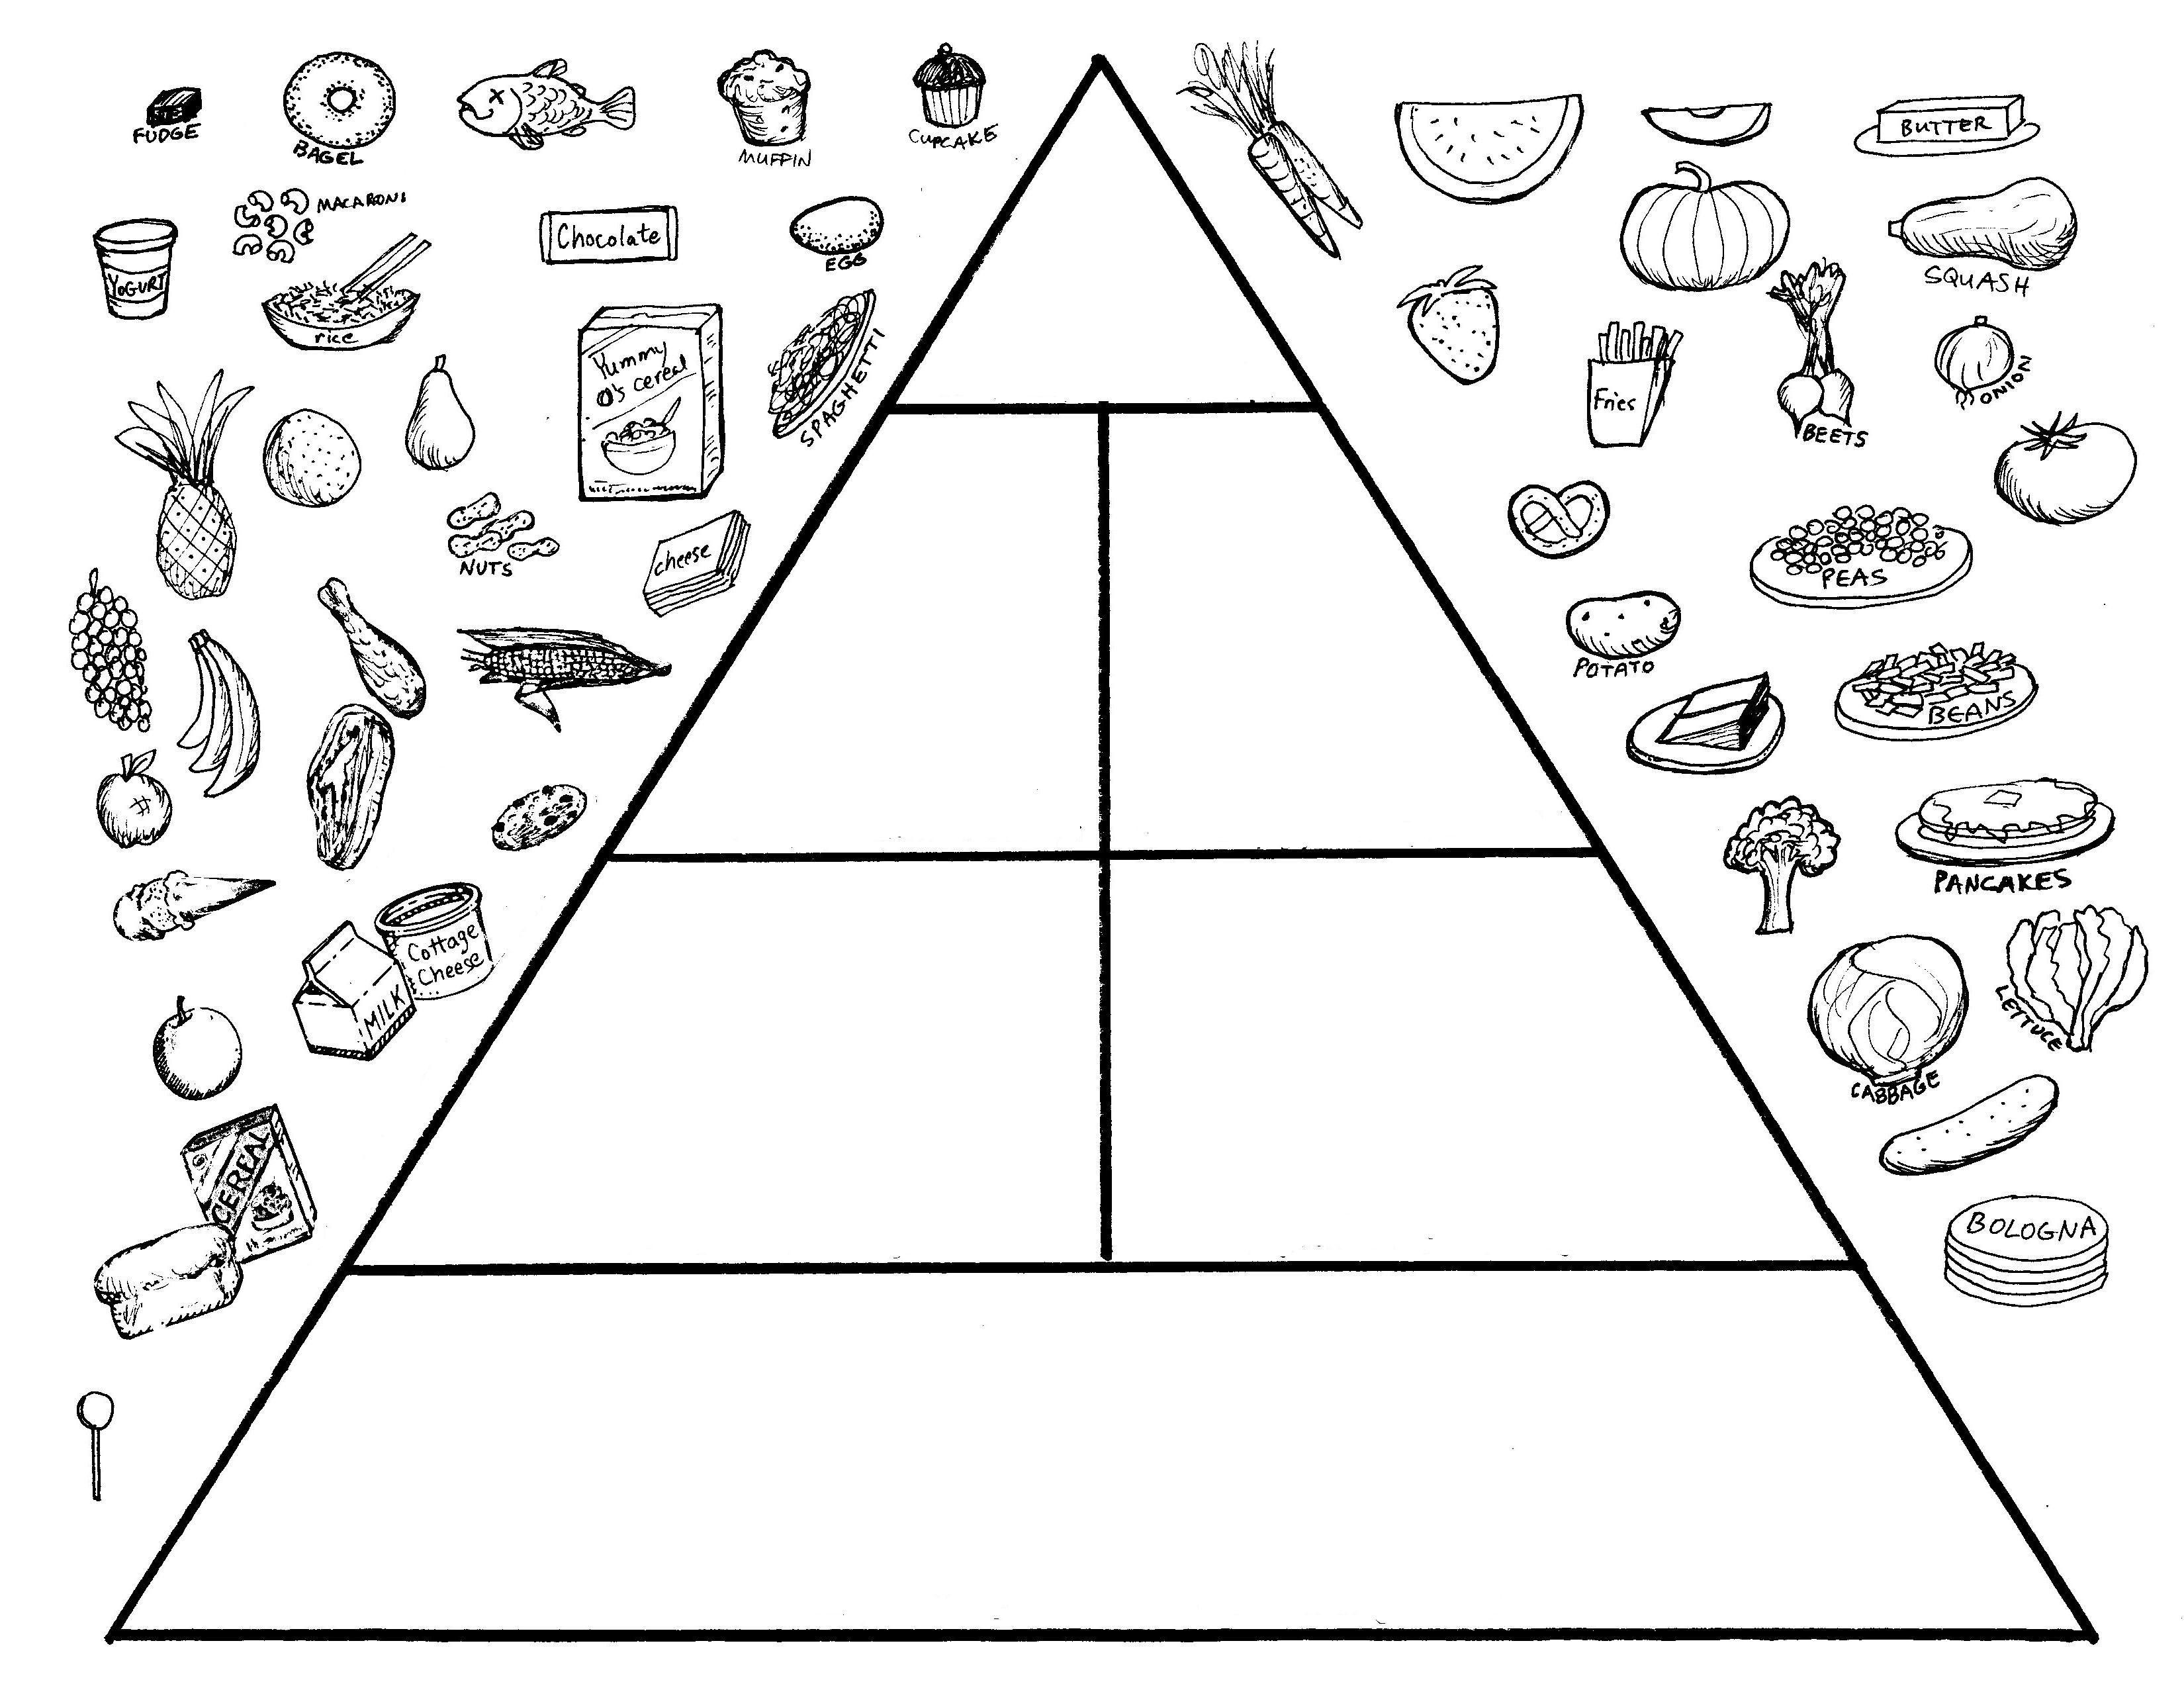 Cut_and_paste_food_pyramid_game jpg 3 300 2 541 pixels